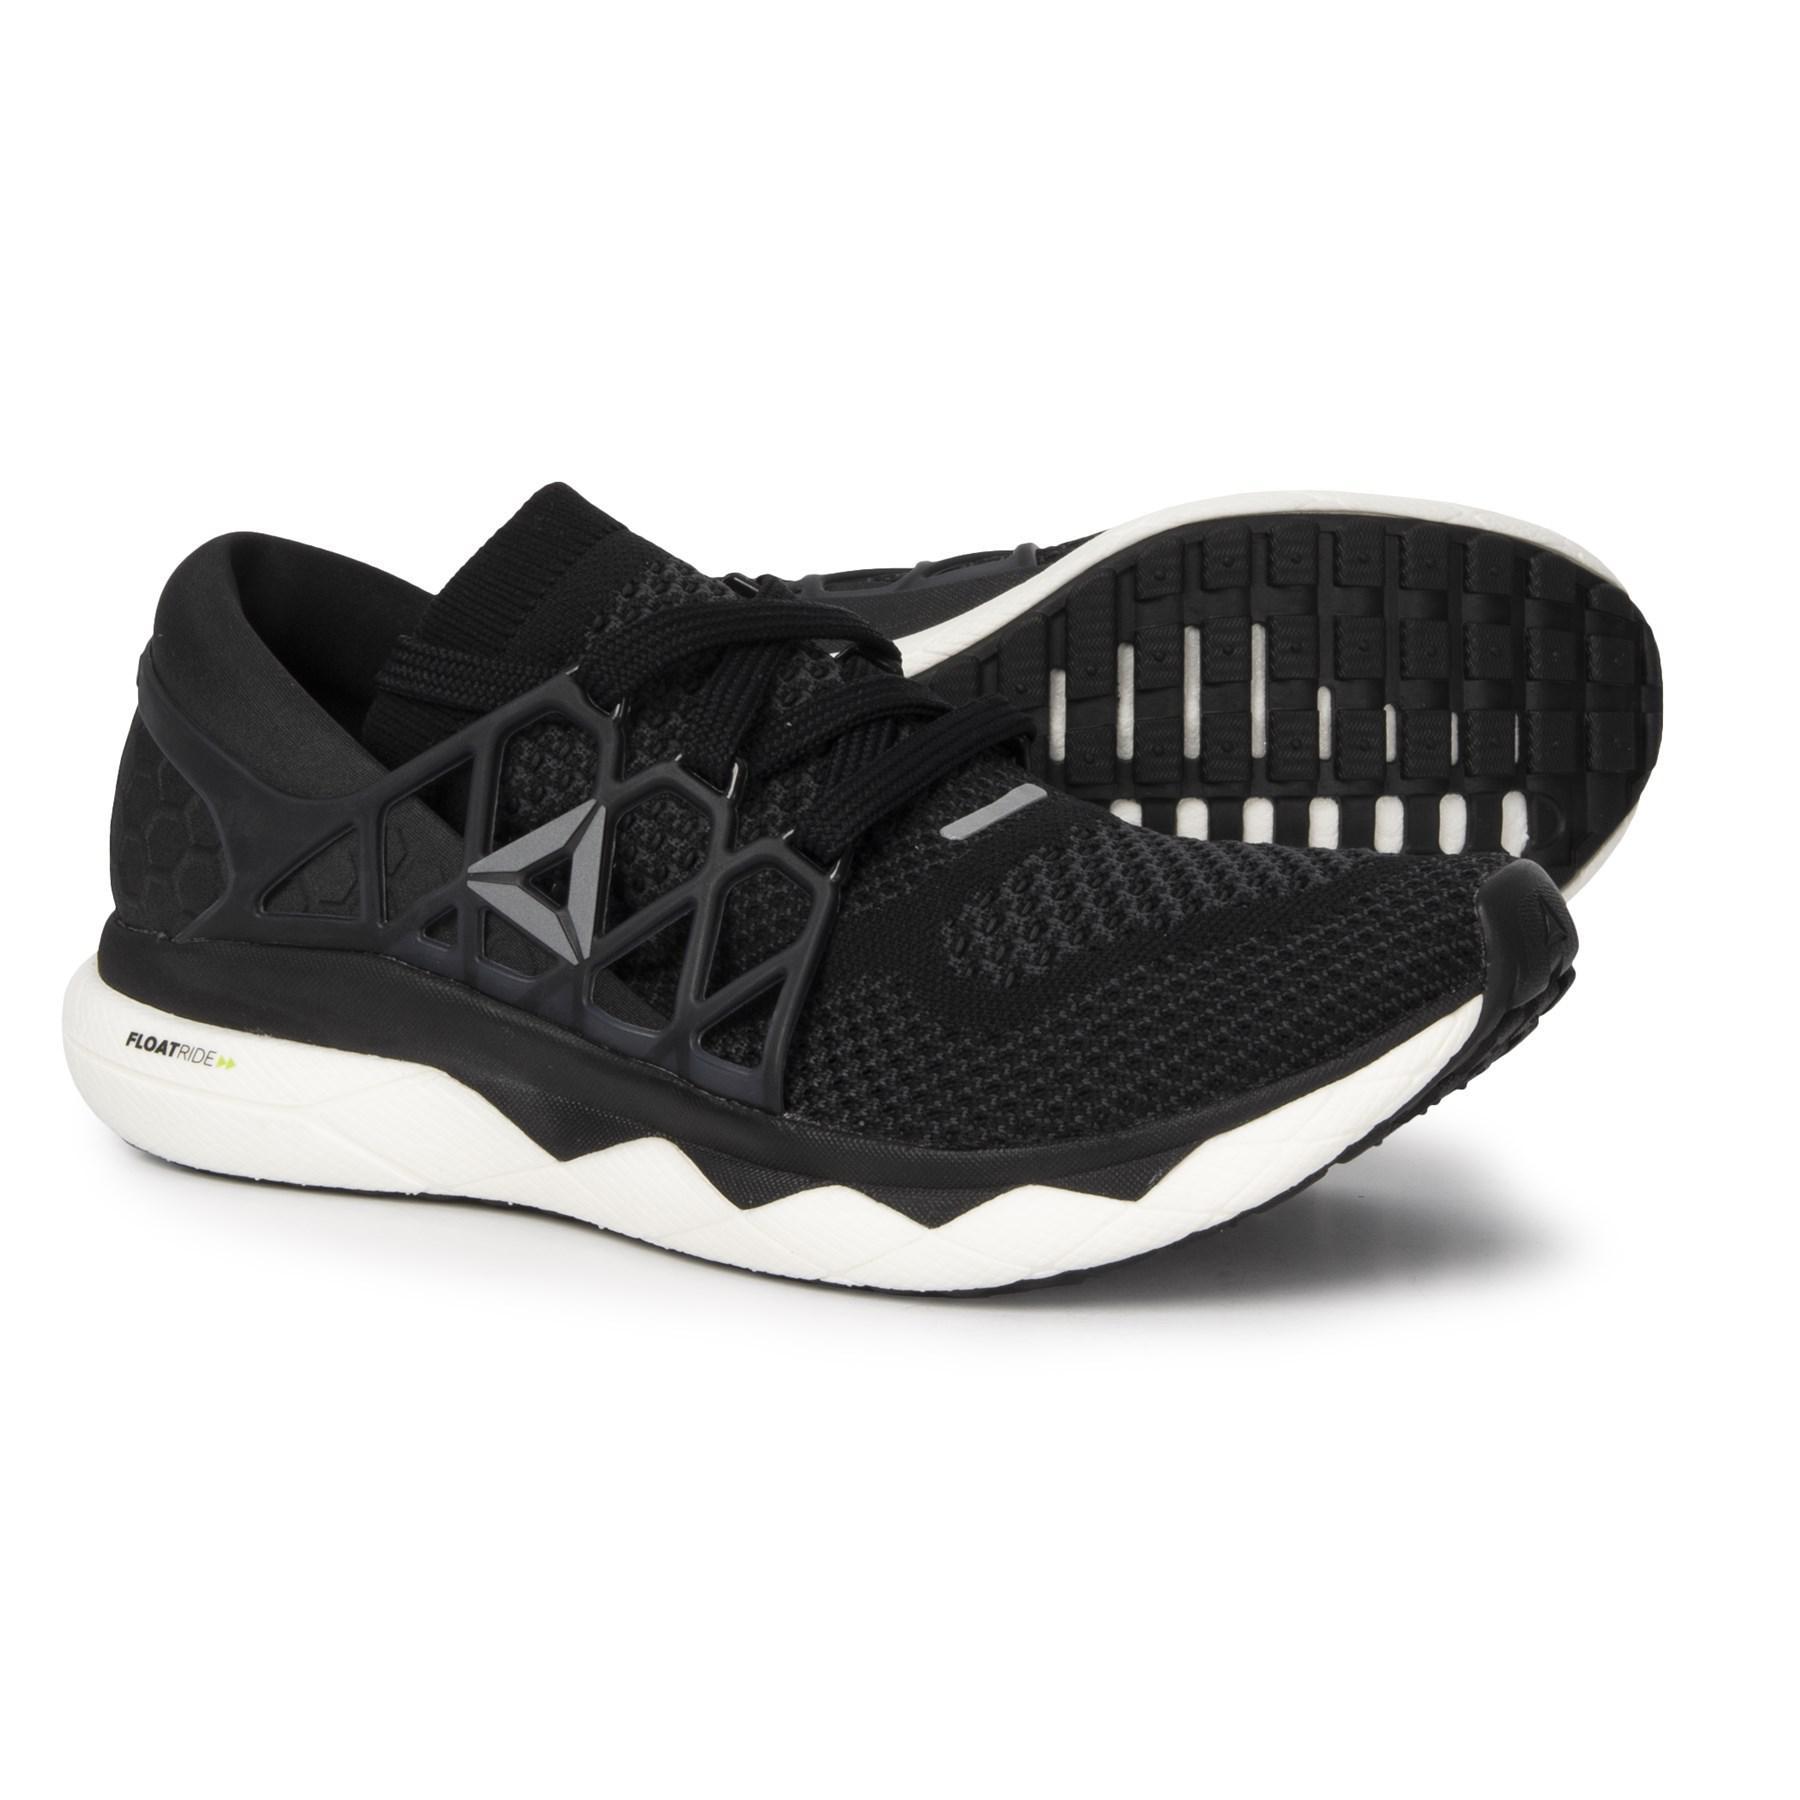 492627c0d55b Lyst - Reebok Floatride Run Ultraknit Running Shoes (for Men) in ...